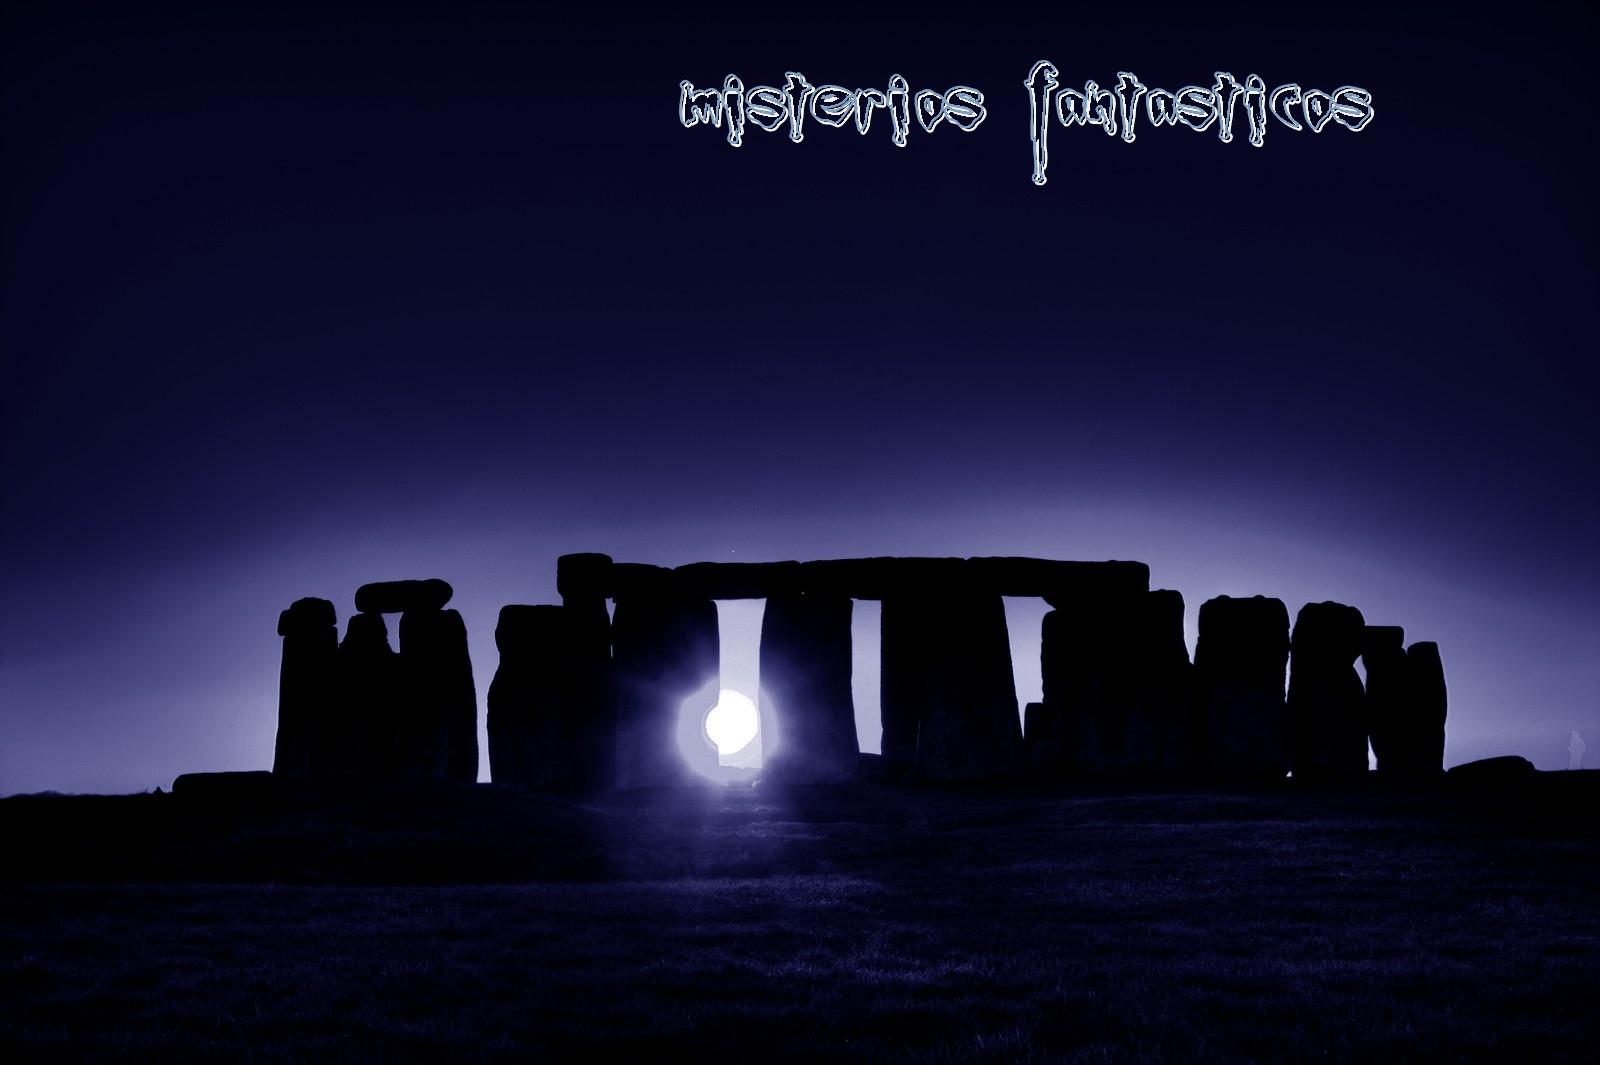 http://2.bp.blogspot.com/_36x37e5S95A/TR5enLy3cPI/AAAAAAAACM8/hKL0BLCF_78/s1600/Wallpapers+Misterios+fantasticos+%252826%2529.jpg